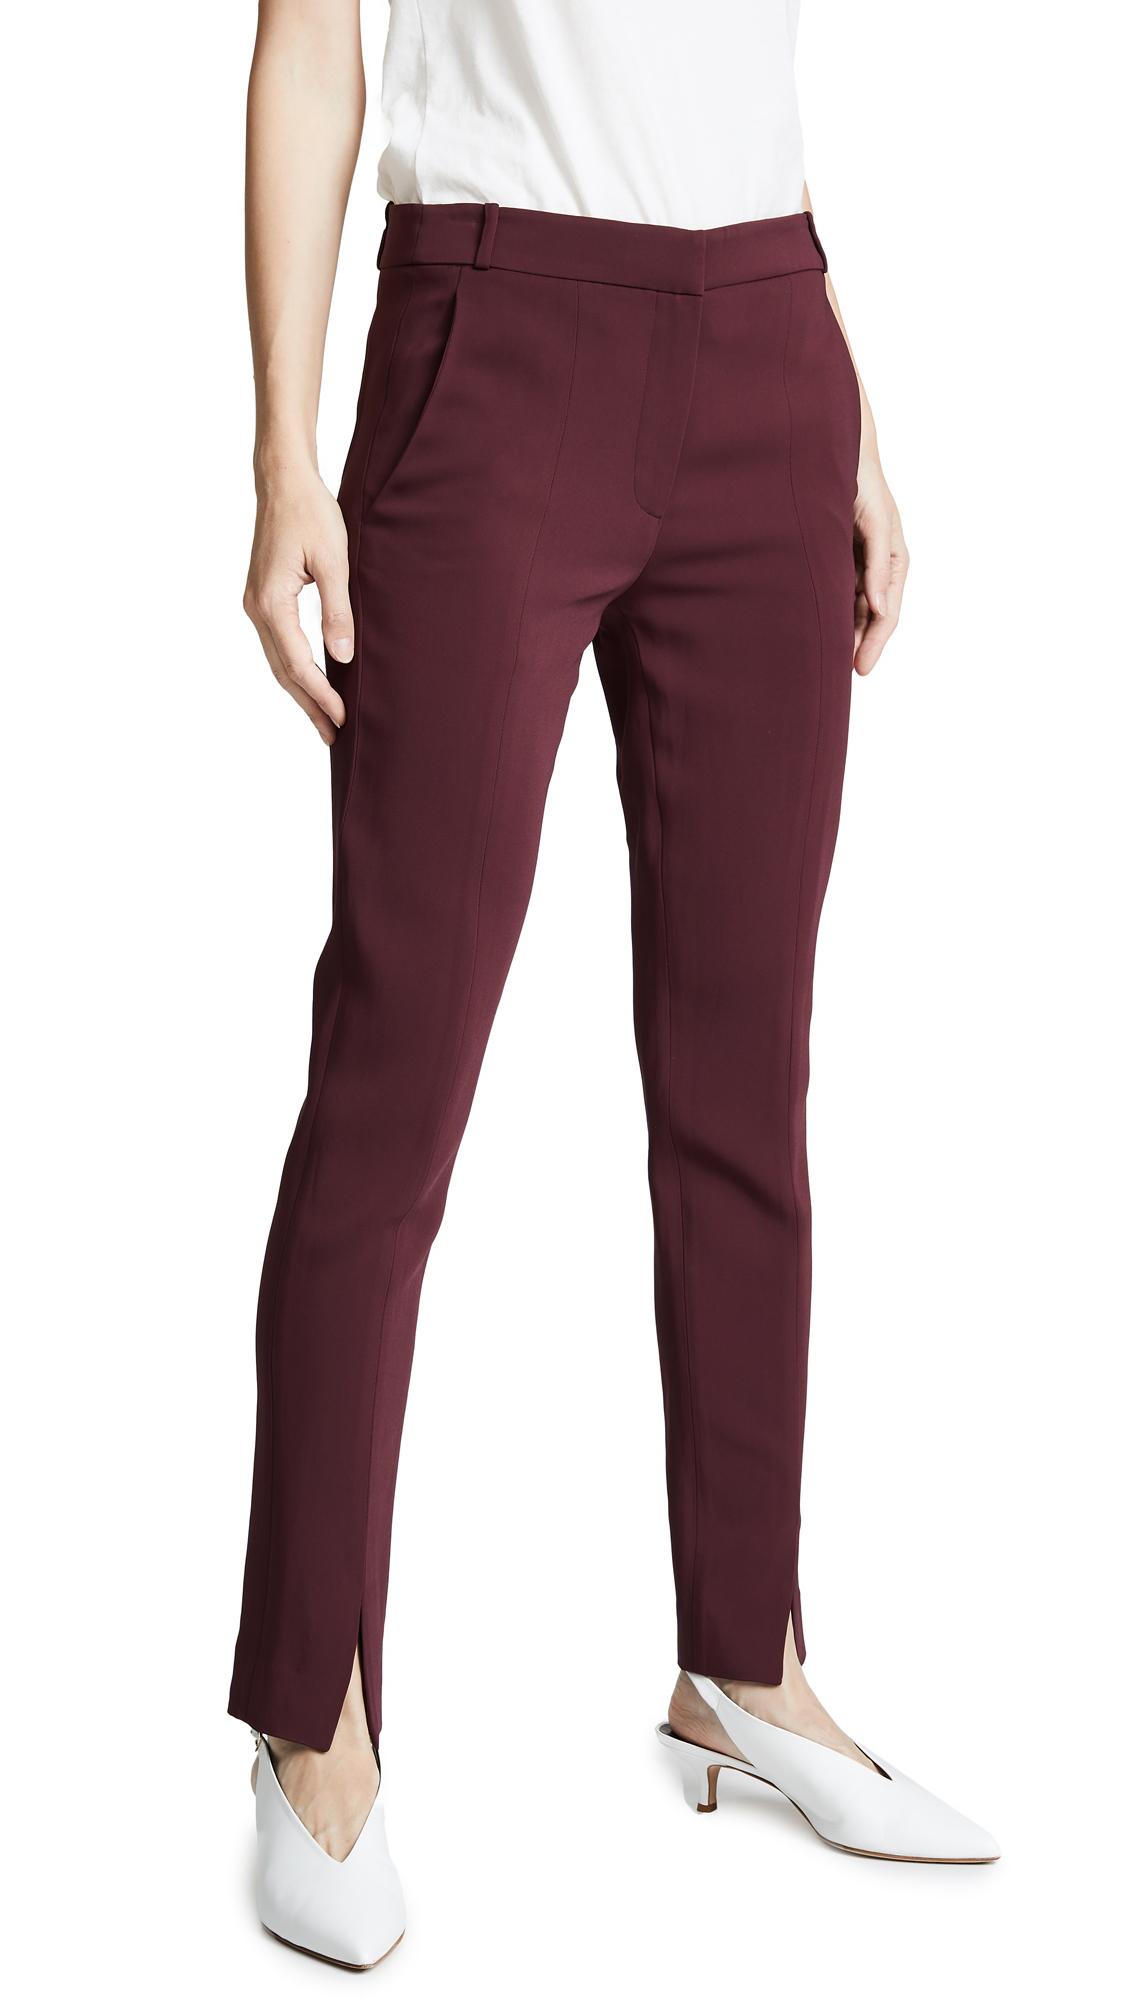 Tibi Beatle Menswear Pants - Dark Currant